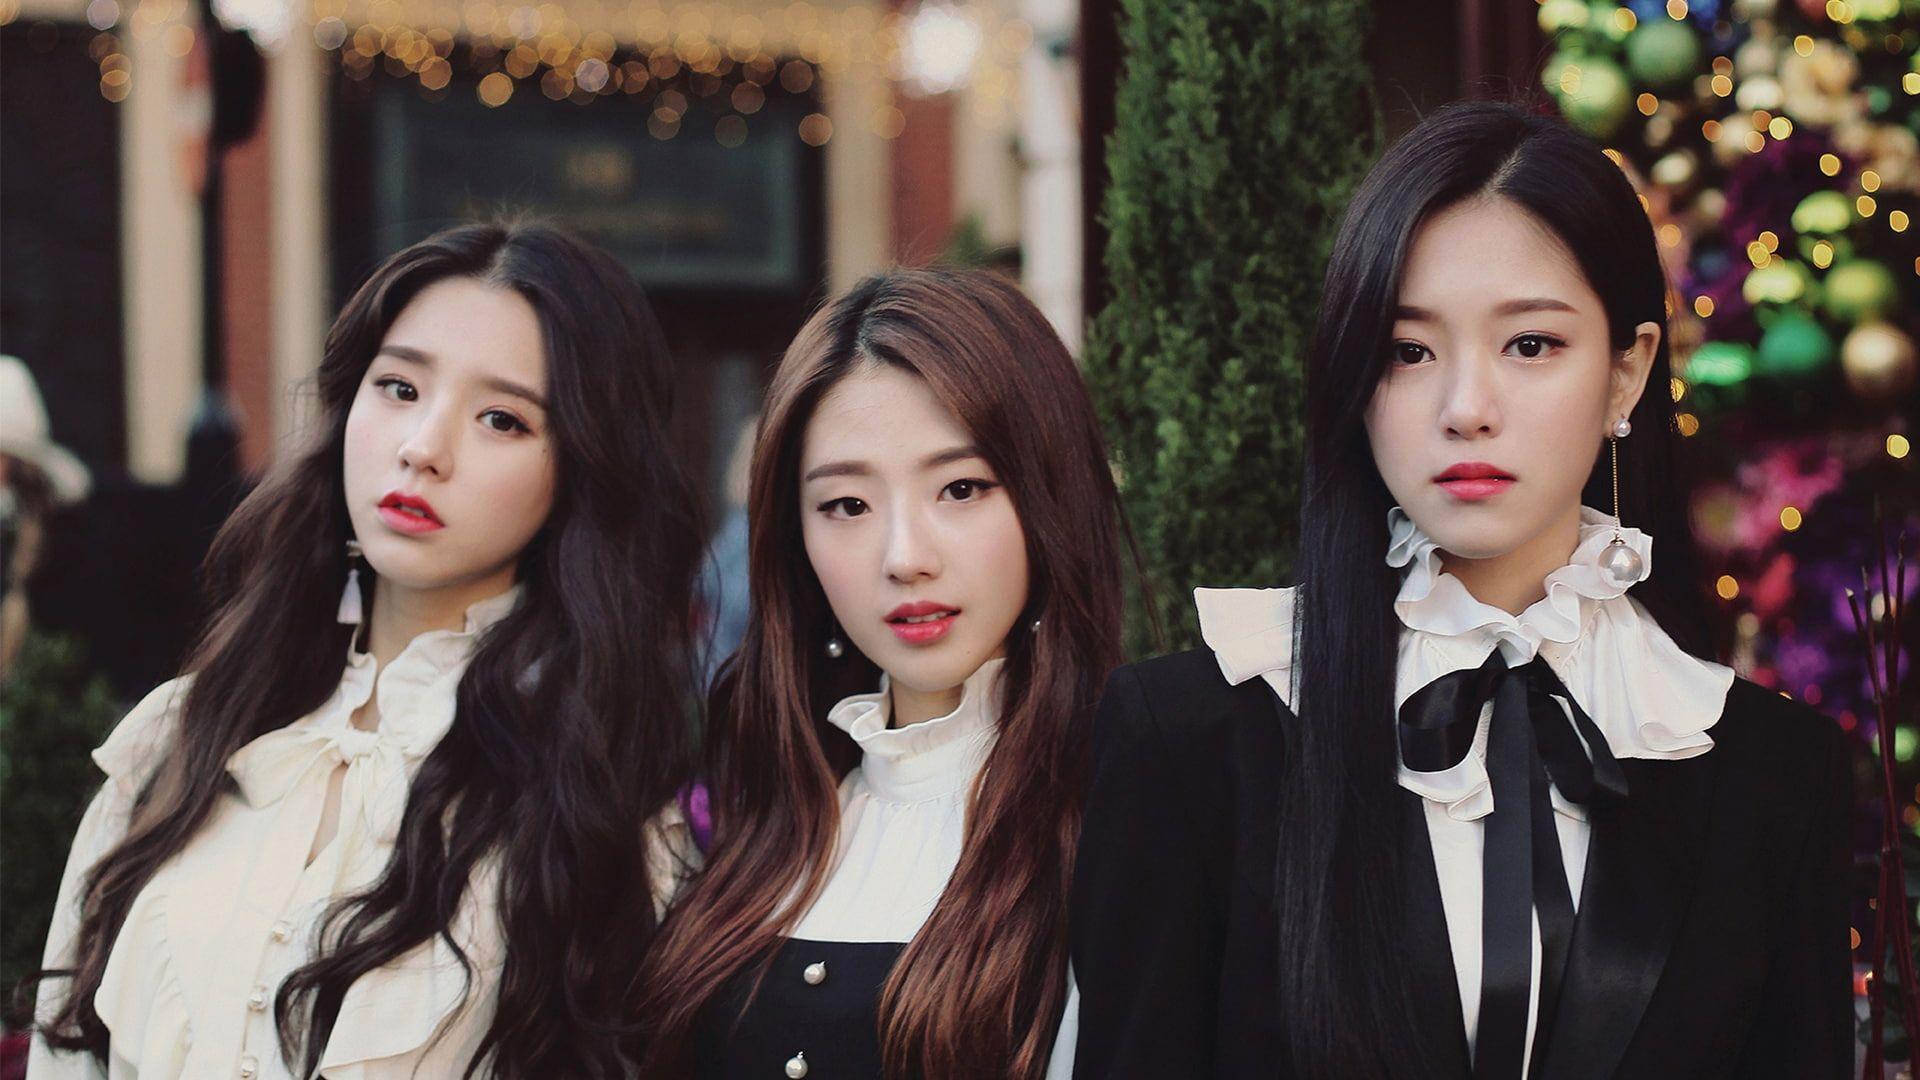 K Pop Loona Asian Women Heejin Hyunjin Haseul 1080p Wallpaper Hdwallpaper Desktop Camera Wallpaper Wallpaper Kpop